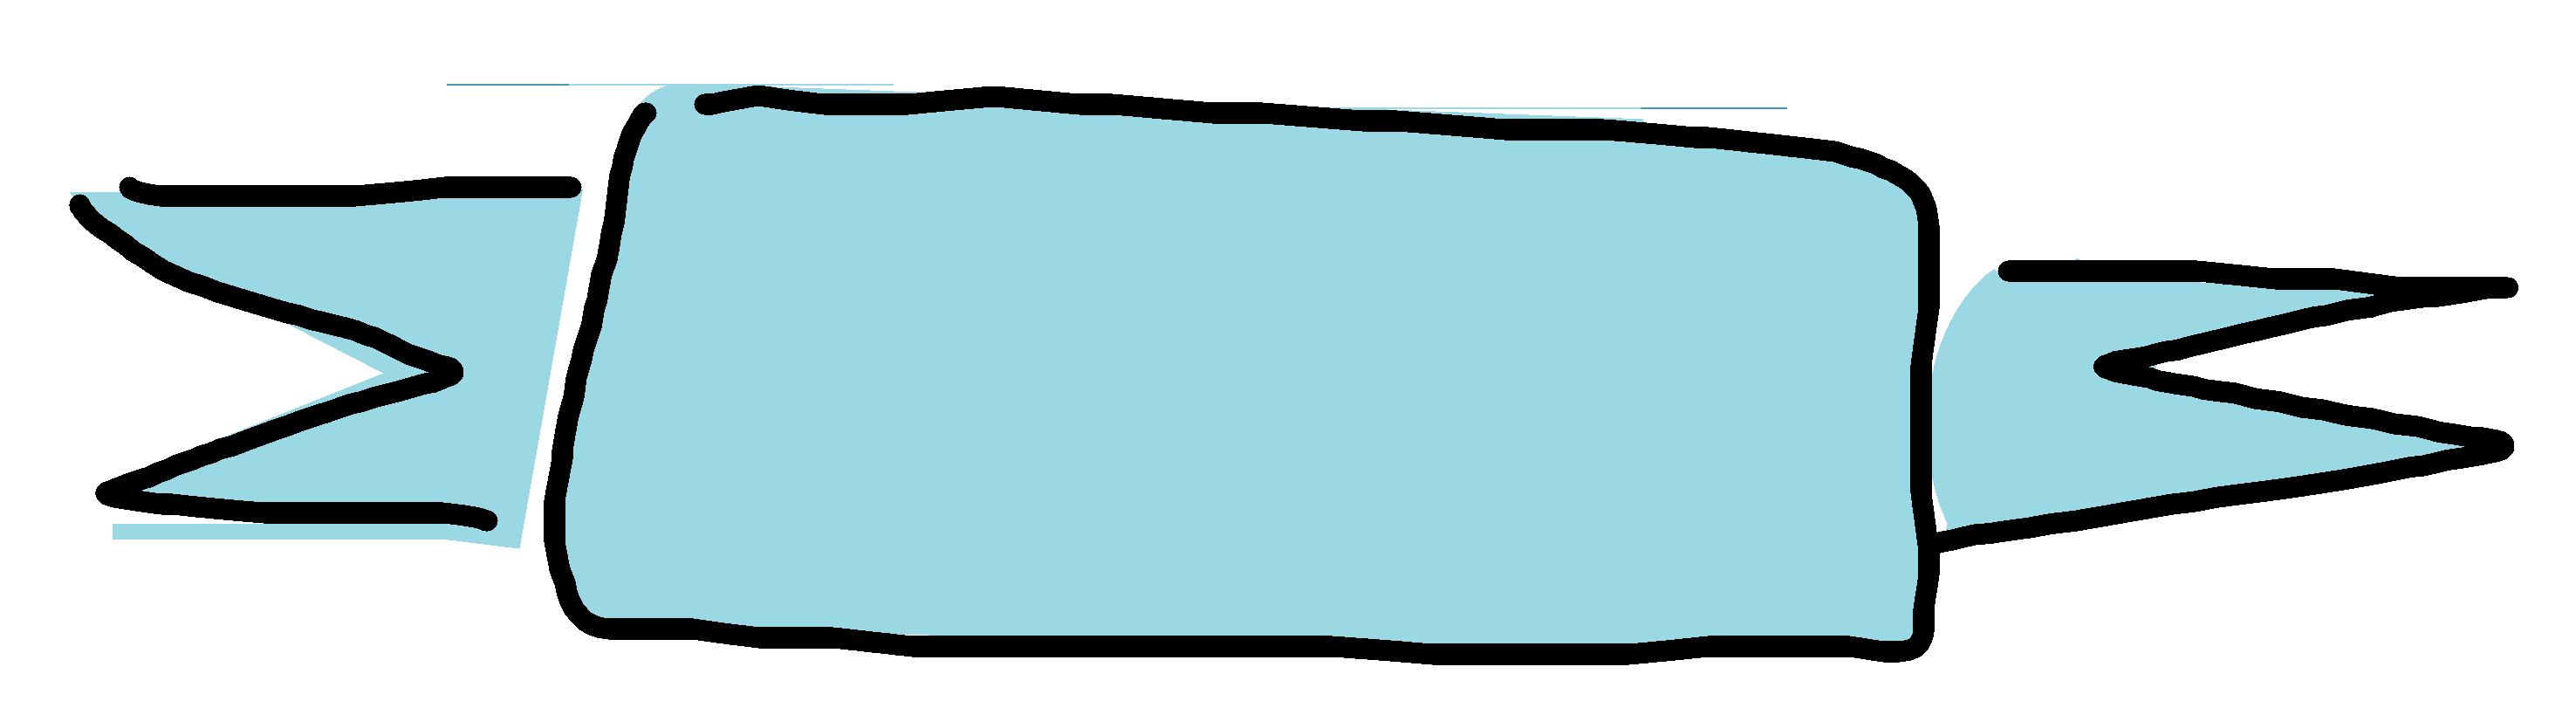 2952x819 Banner Clipart